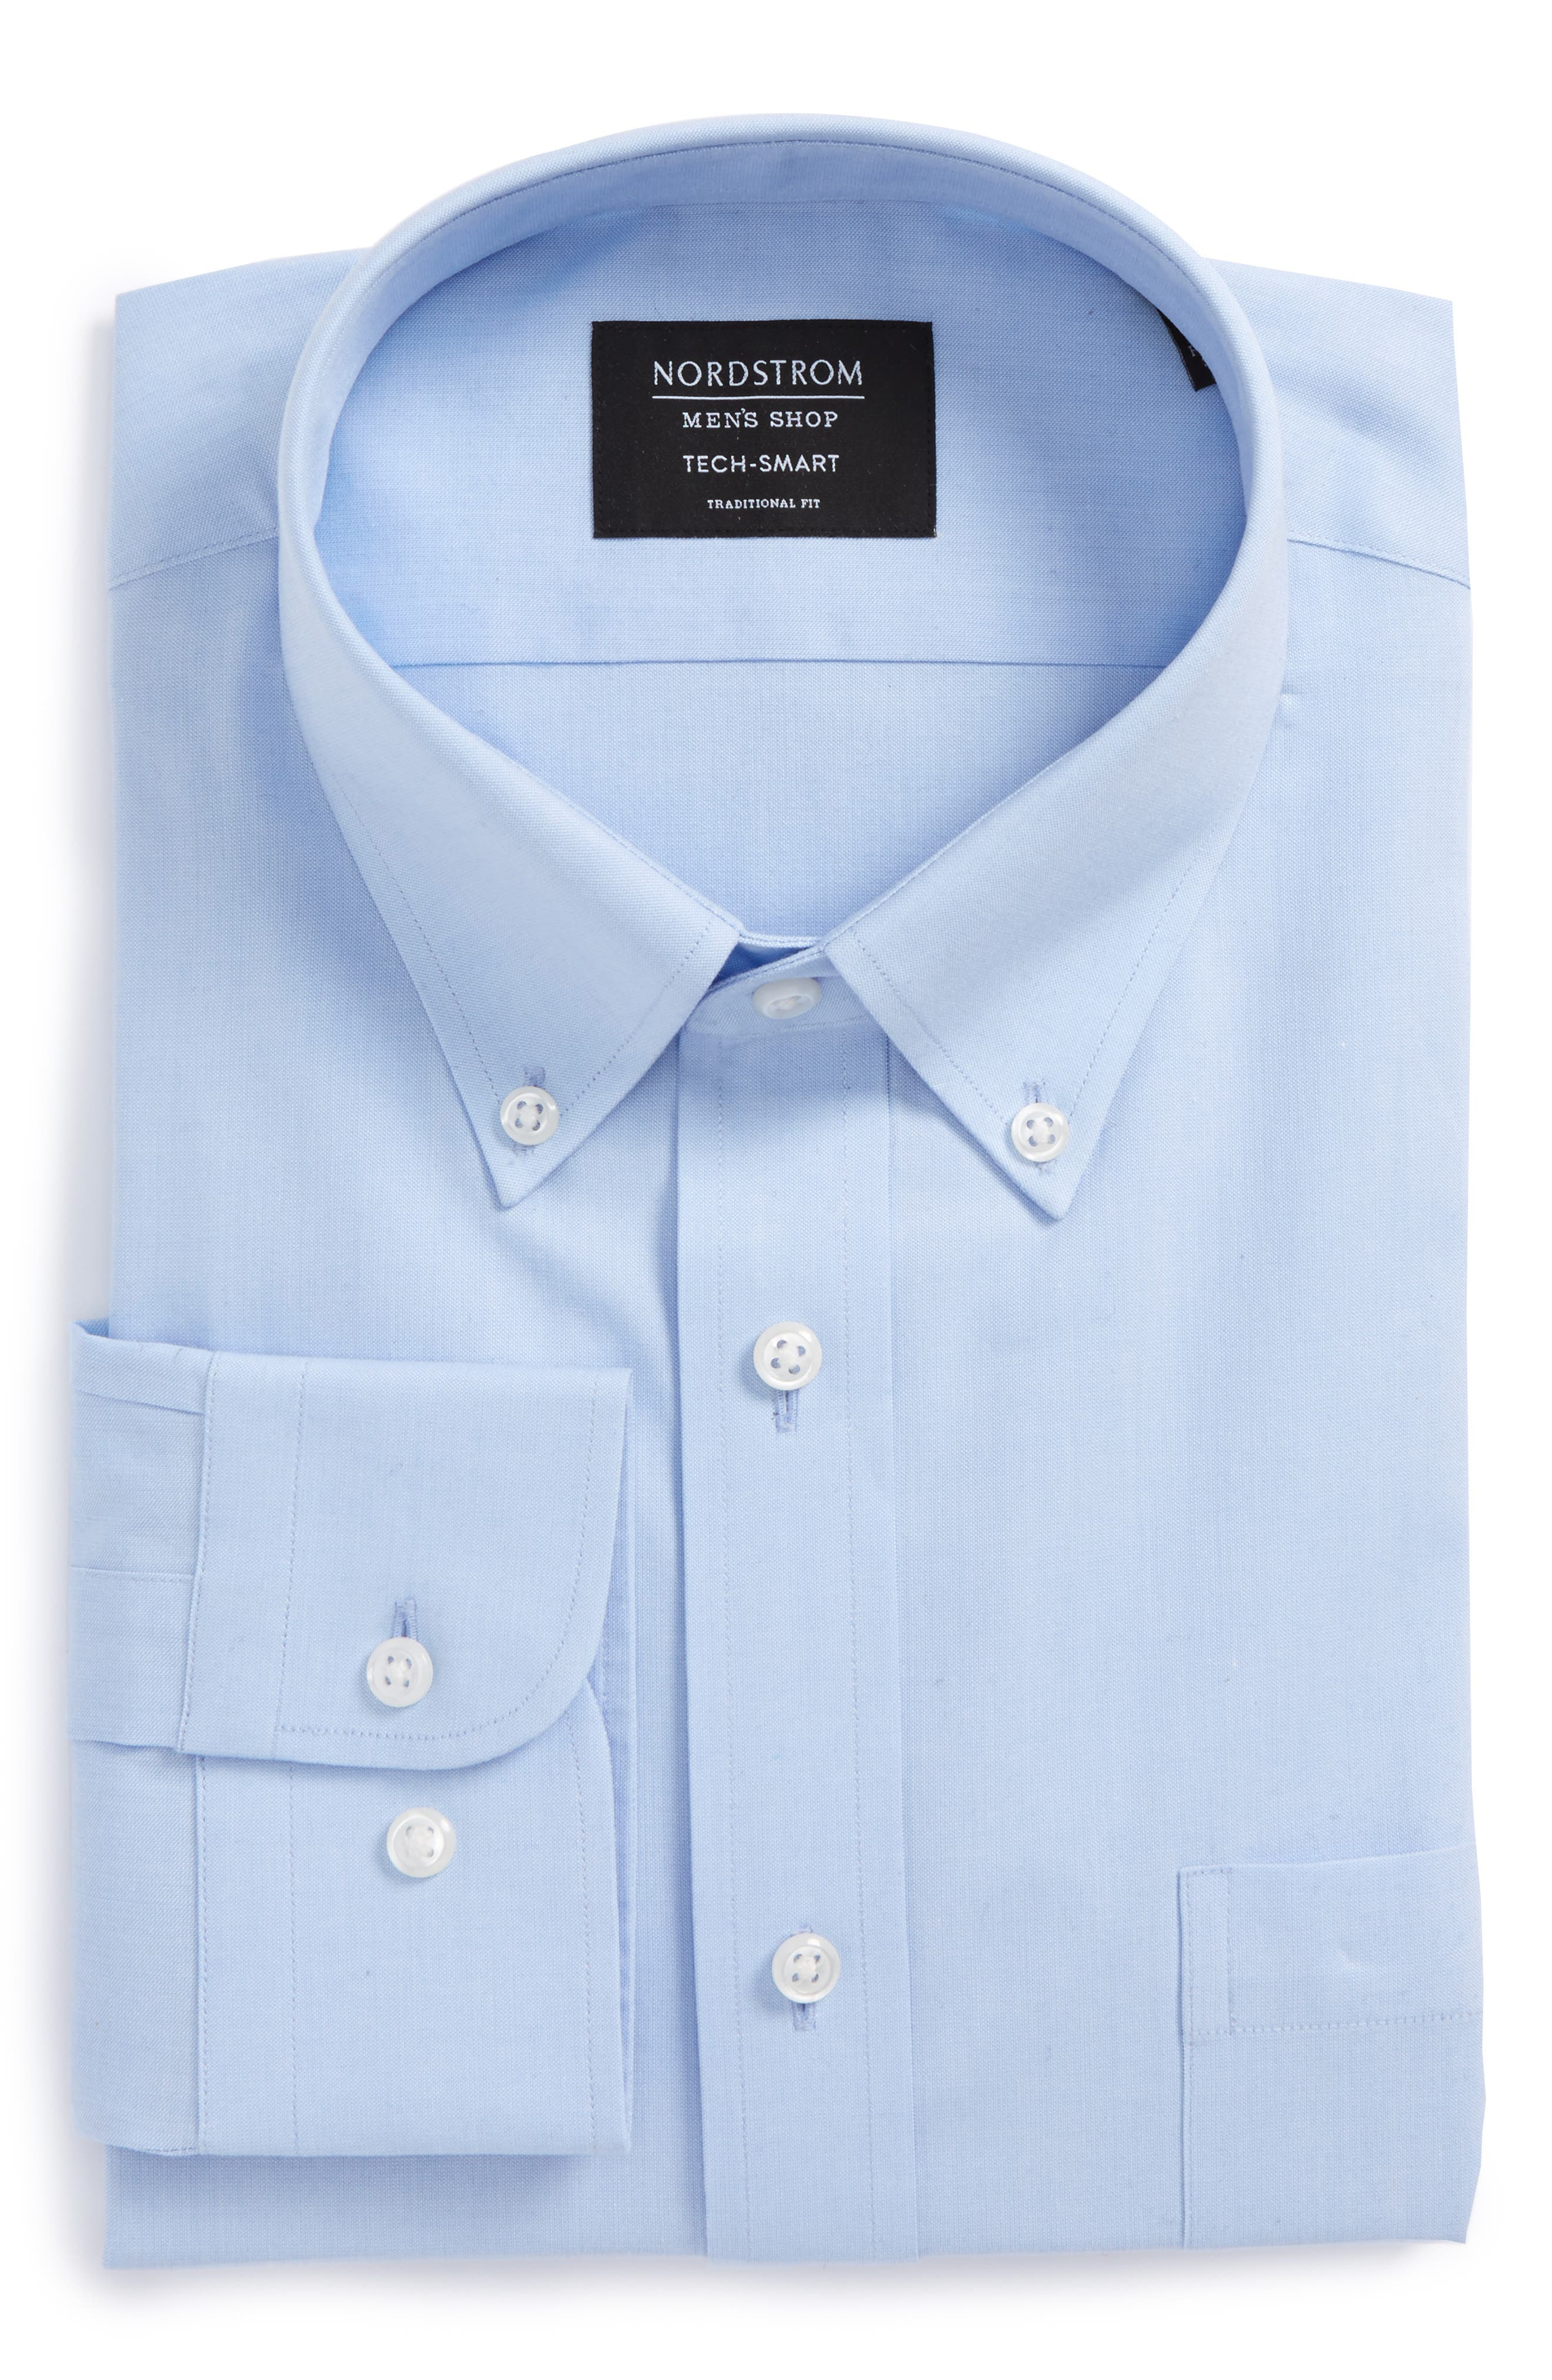 Nordstrom Men's Shop Tech-Smart Traditional Fit Stretch Solid Dress Shirt